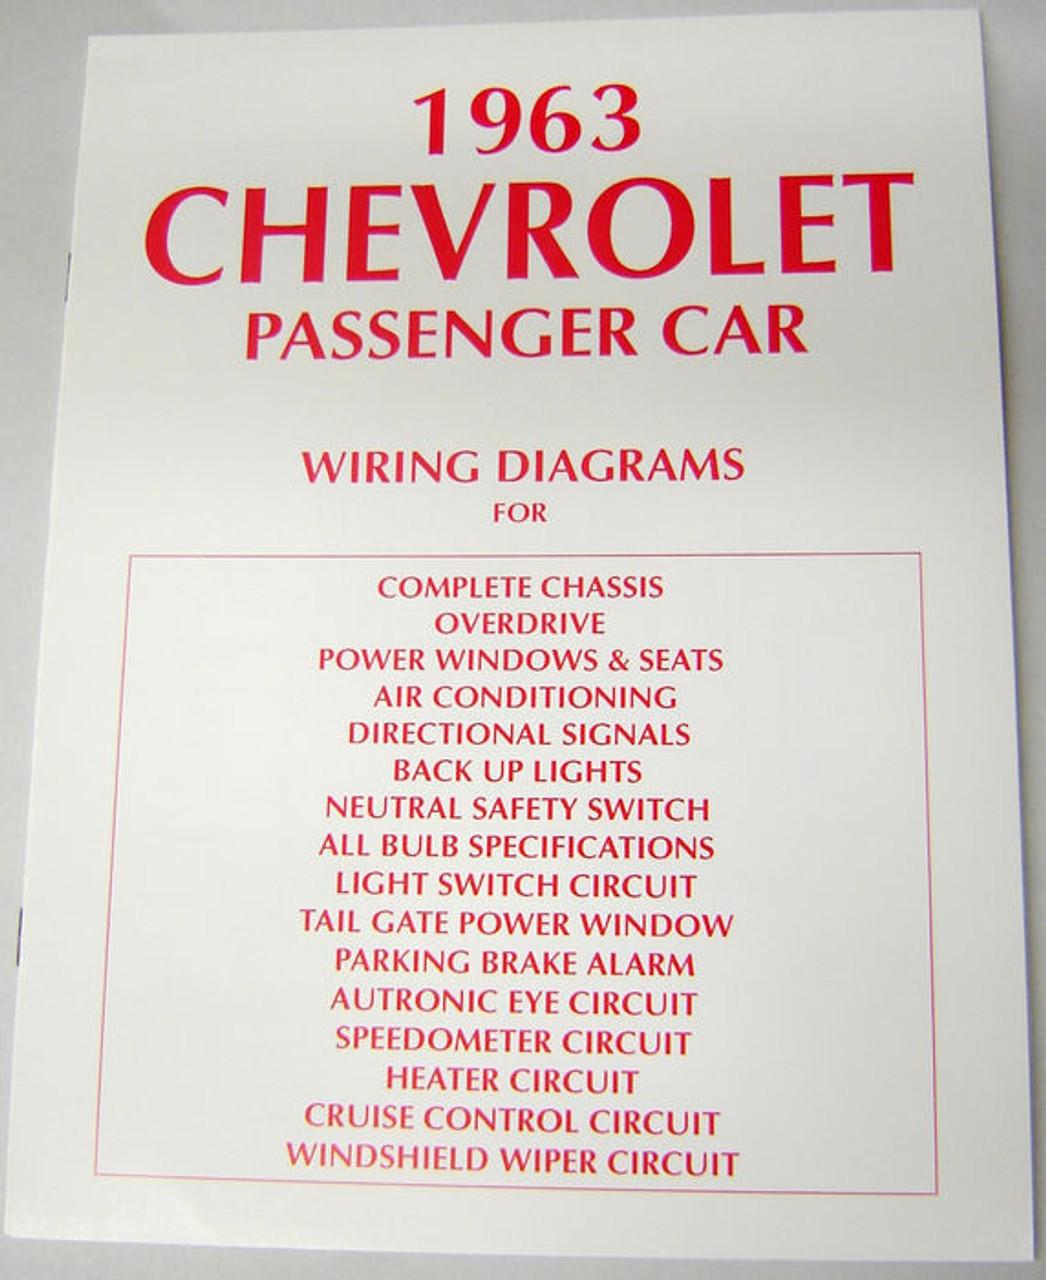 63 chevy impala electrical wiring diagram manual 1963 i 5 classic rh i5chevy com 1963 chevrolet impala wiring diagram 1963 impala ss wiring diagram